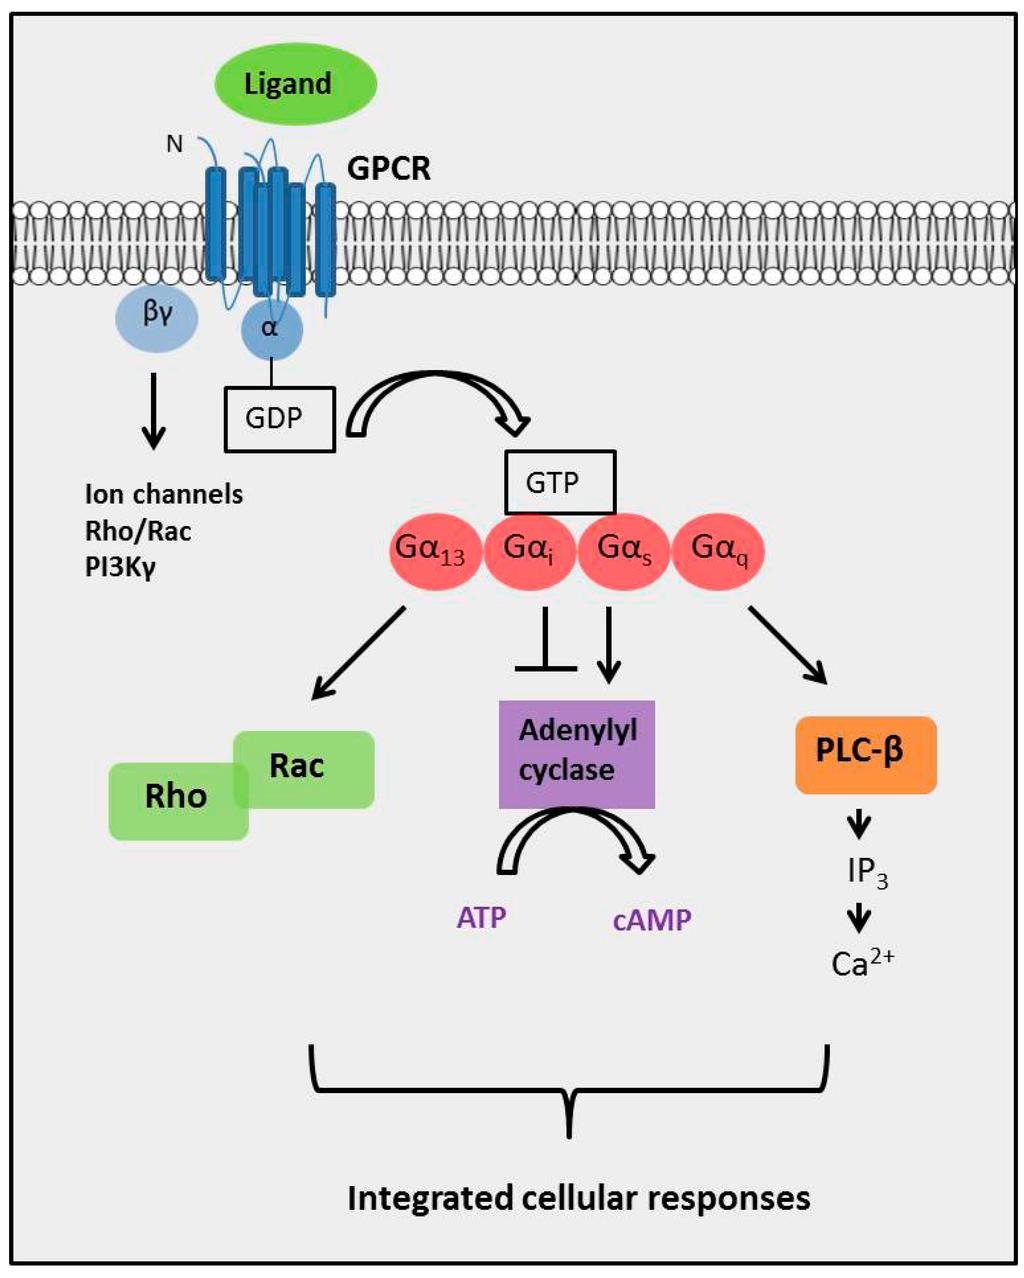 essays in g protein coupled receptors Vertebrate bitter taste receptors: keys for survival in changing environments g protein-coupled receptors view.